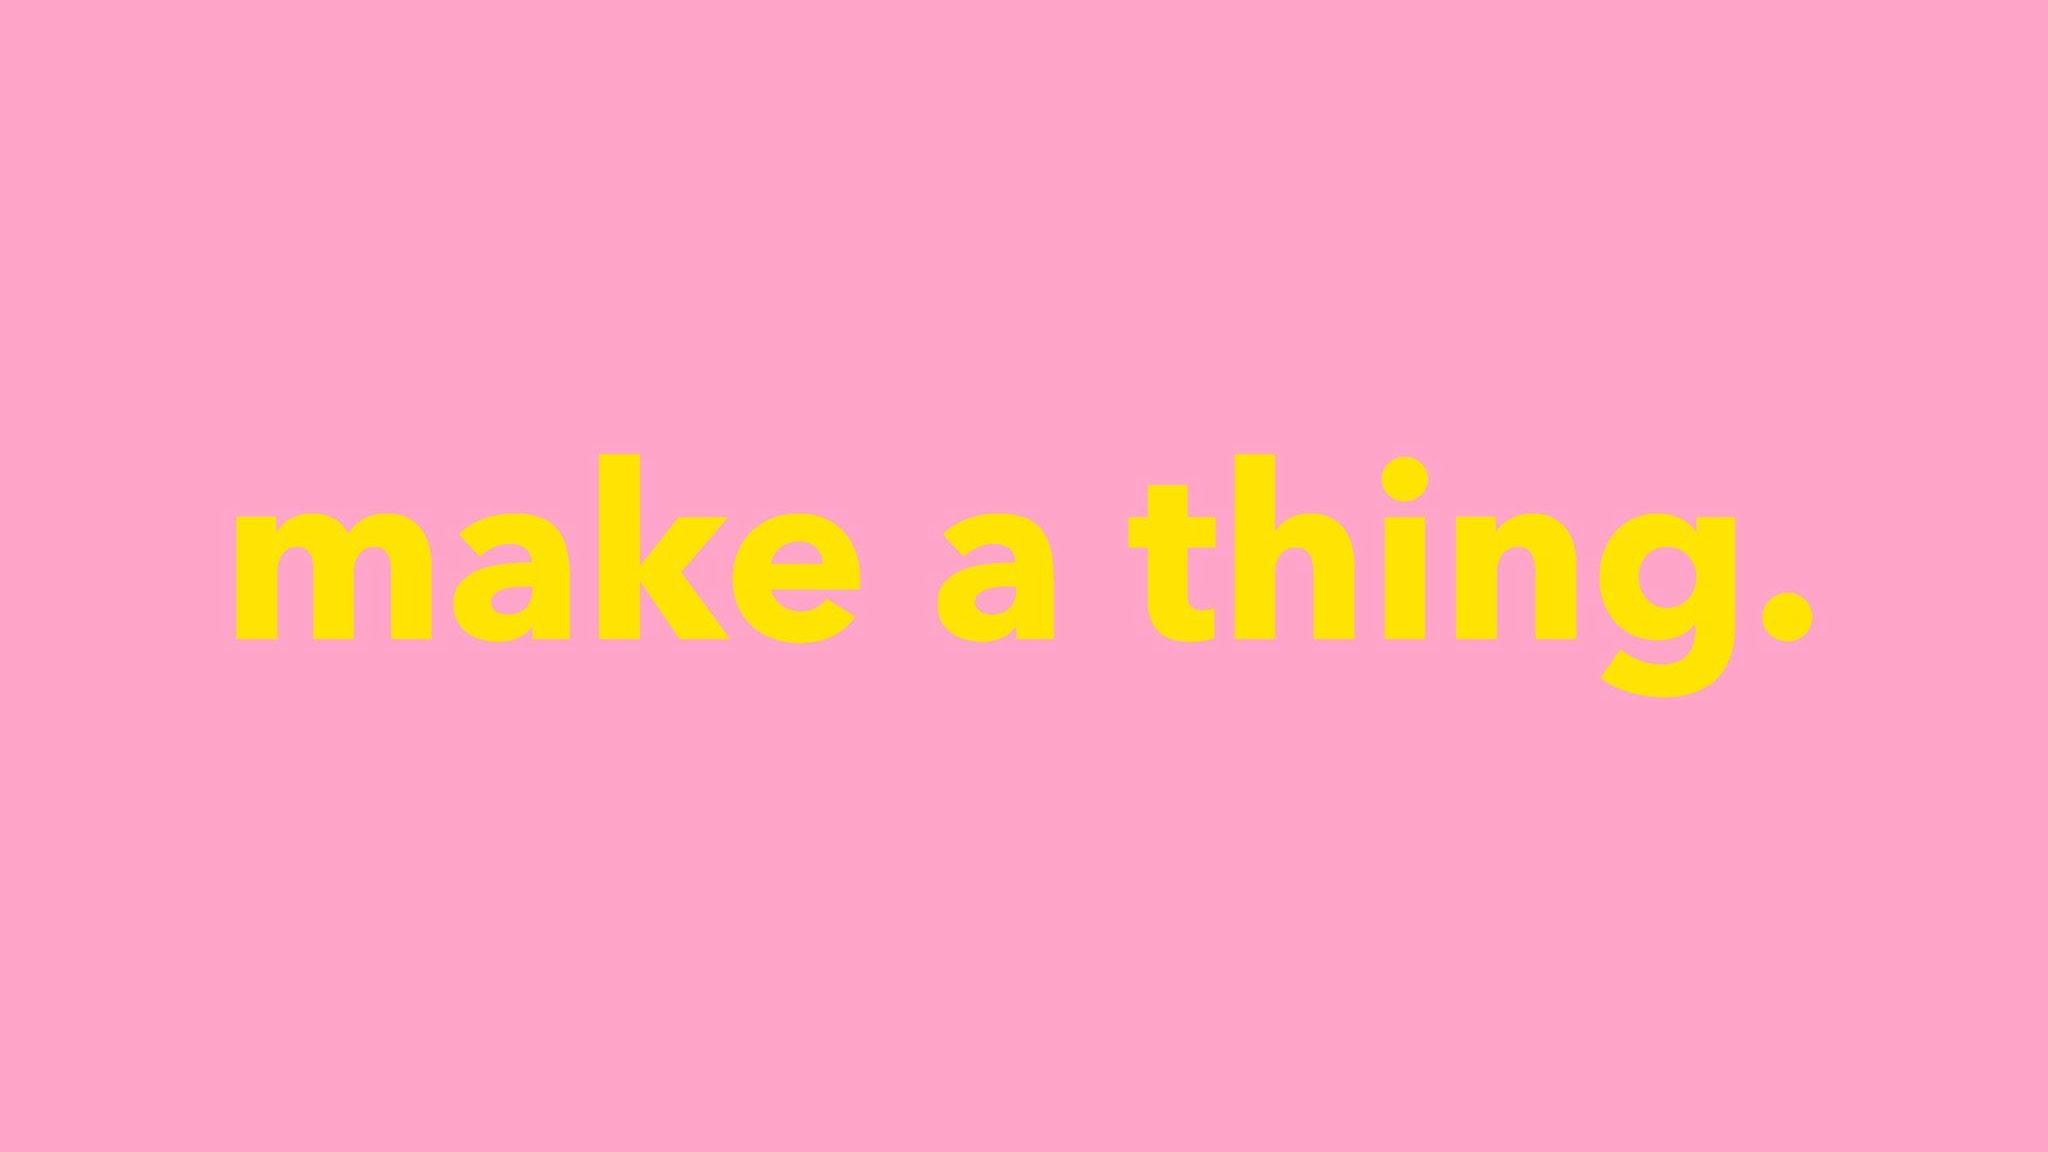 Make A Thing